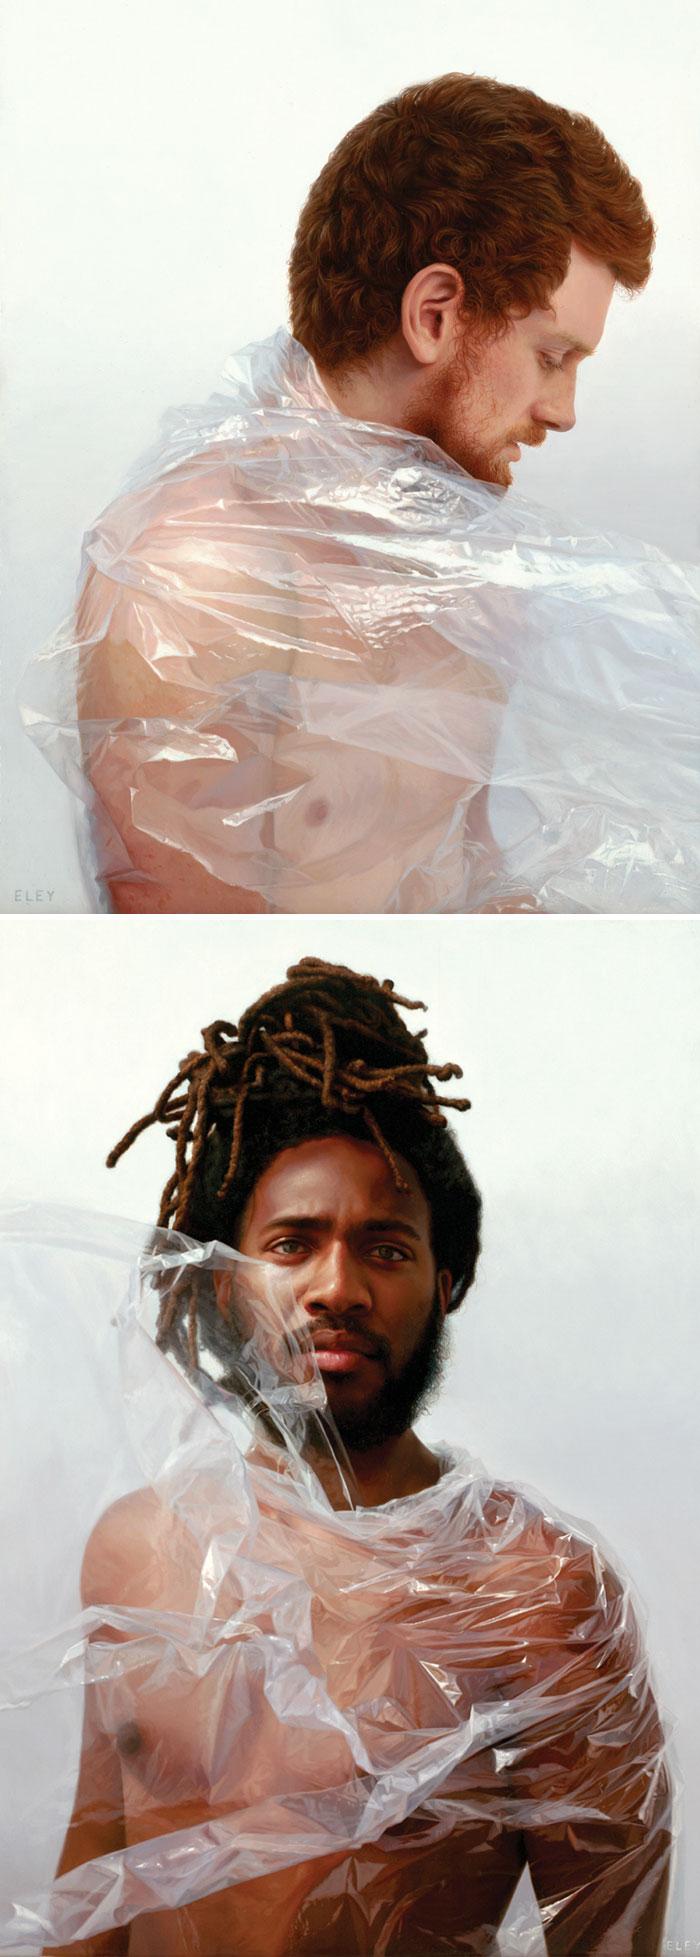 hyperrealistic-art-photorealistic-paintings-look-like-photos-12-58218b18549bd__700